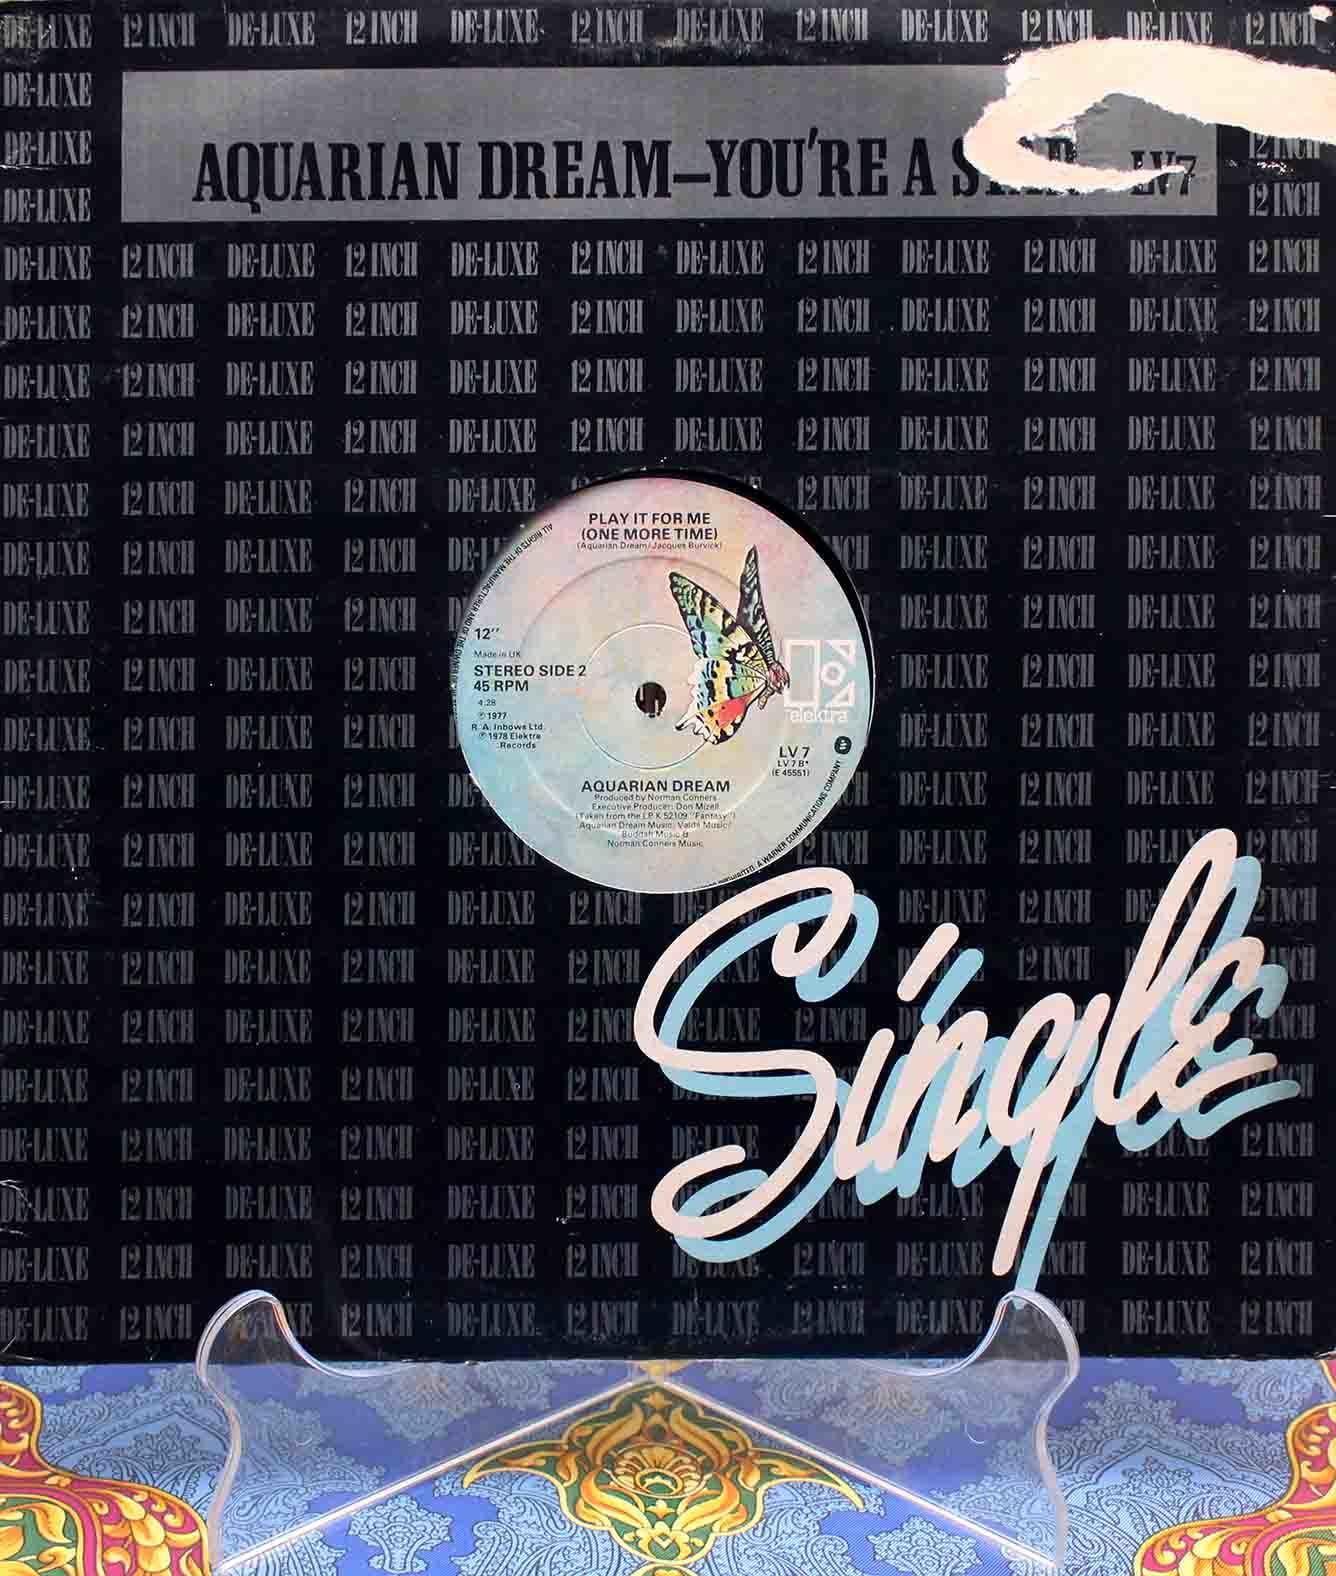 Aquarian Dream – Youre A Star 02